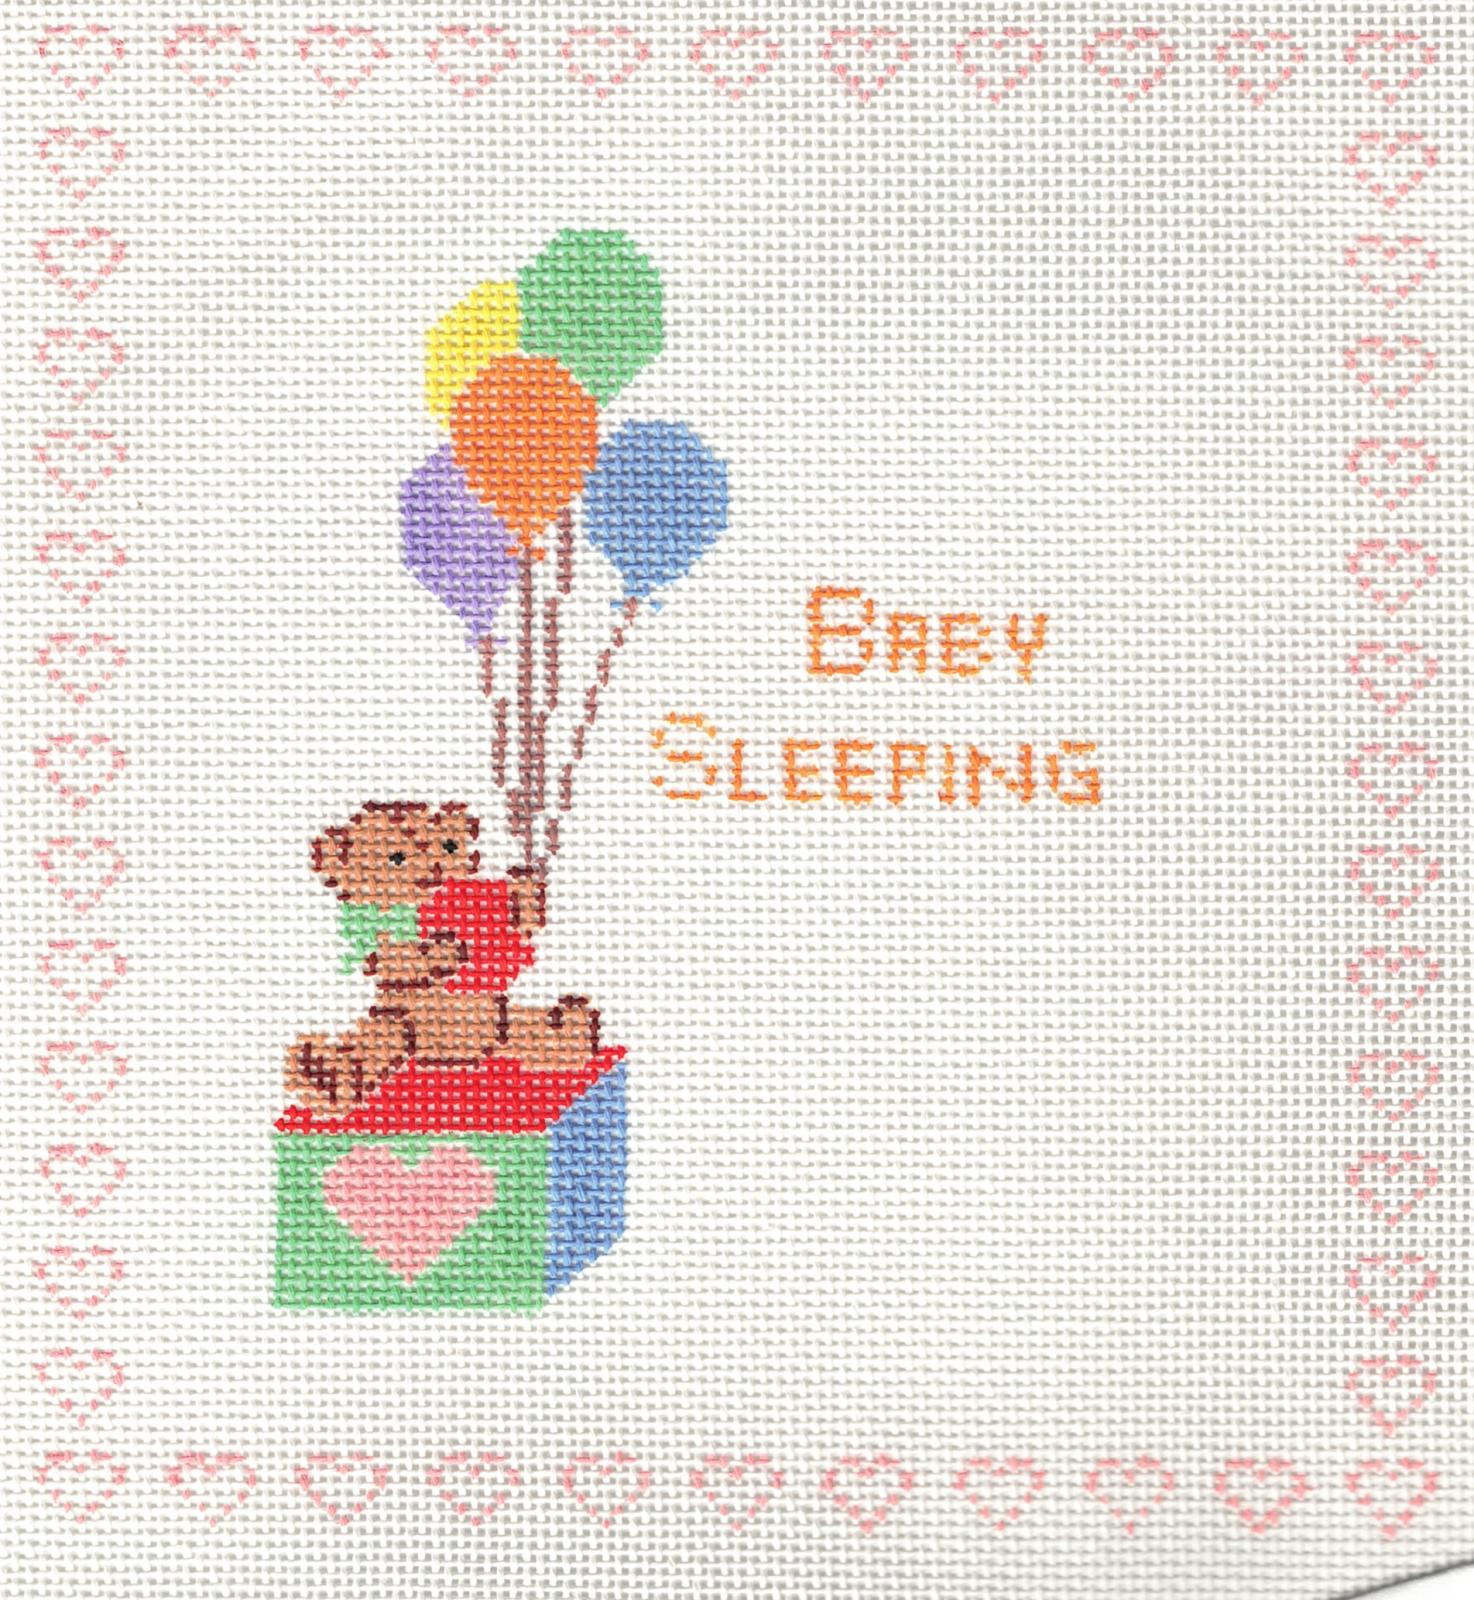 Teddy Bear Baby Sleeping - 18 M